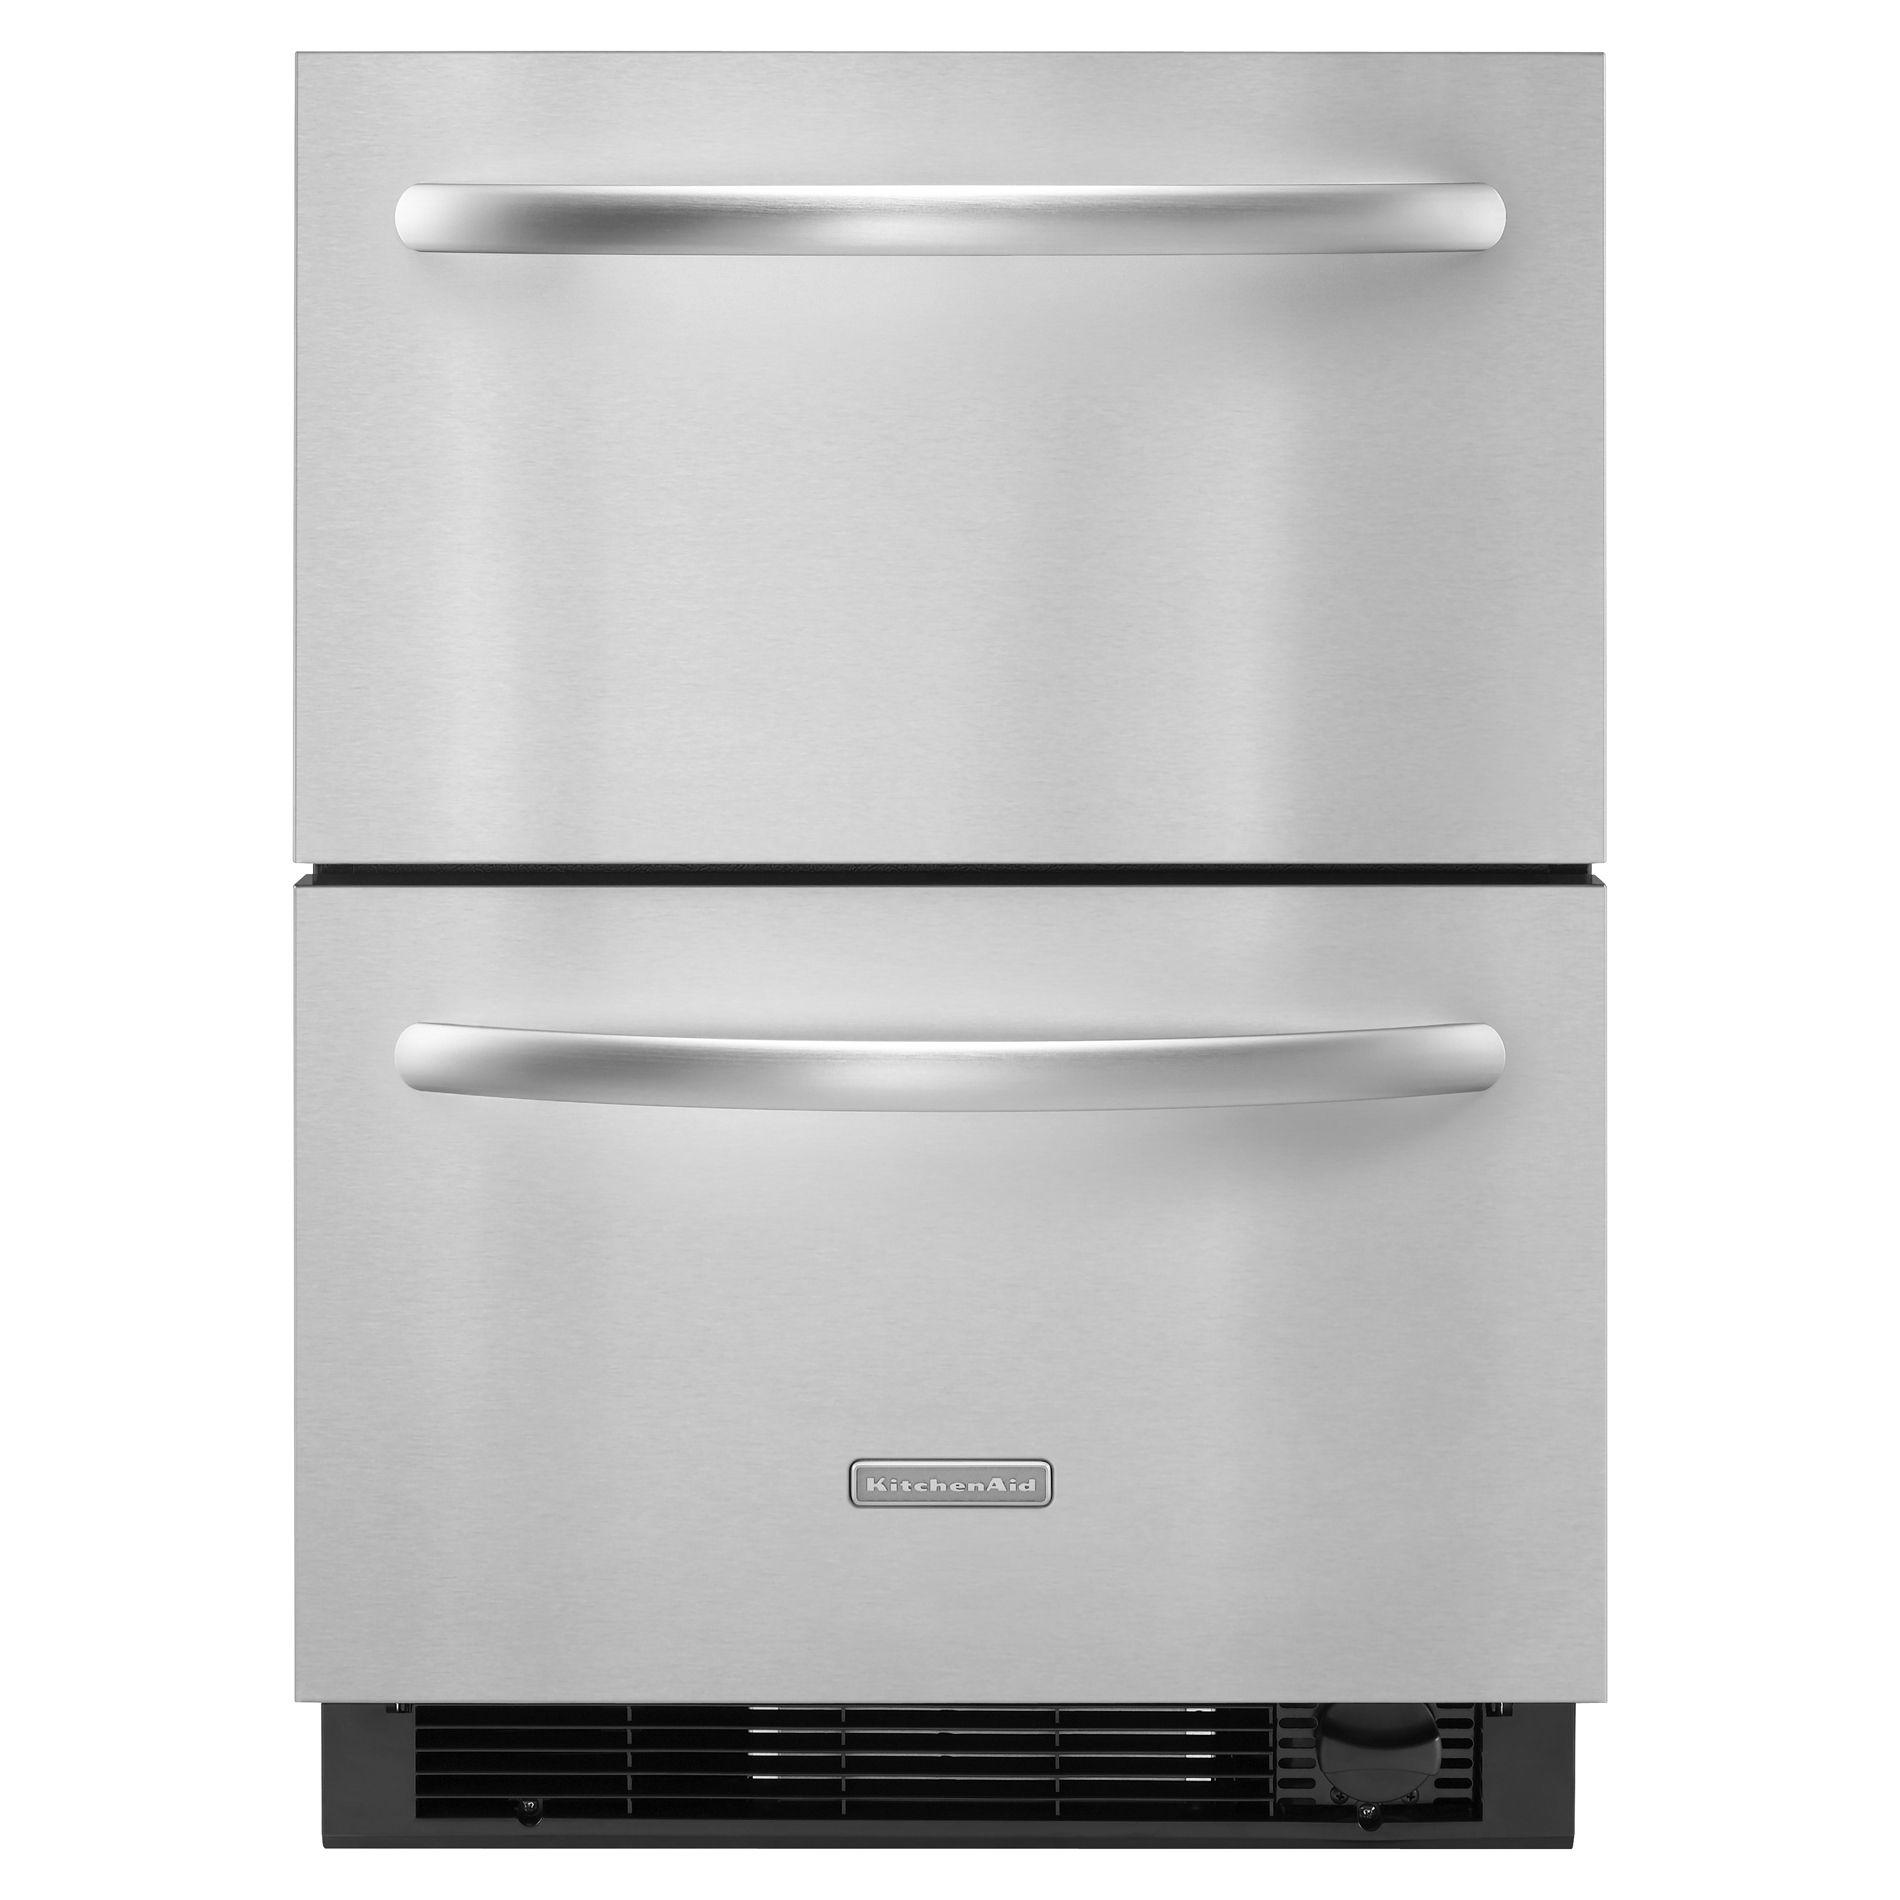 4.8 Cu. Ft. Refrigerator/Freezer